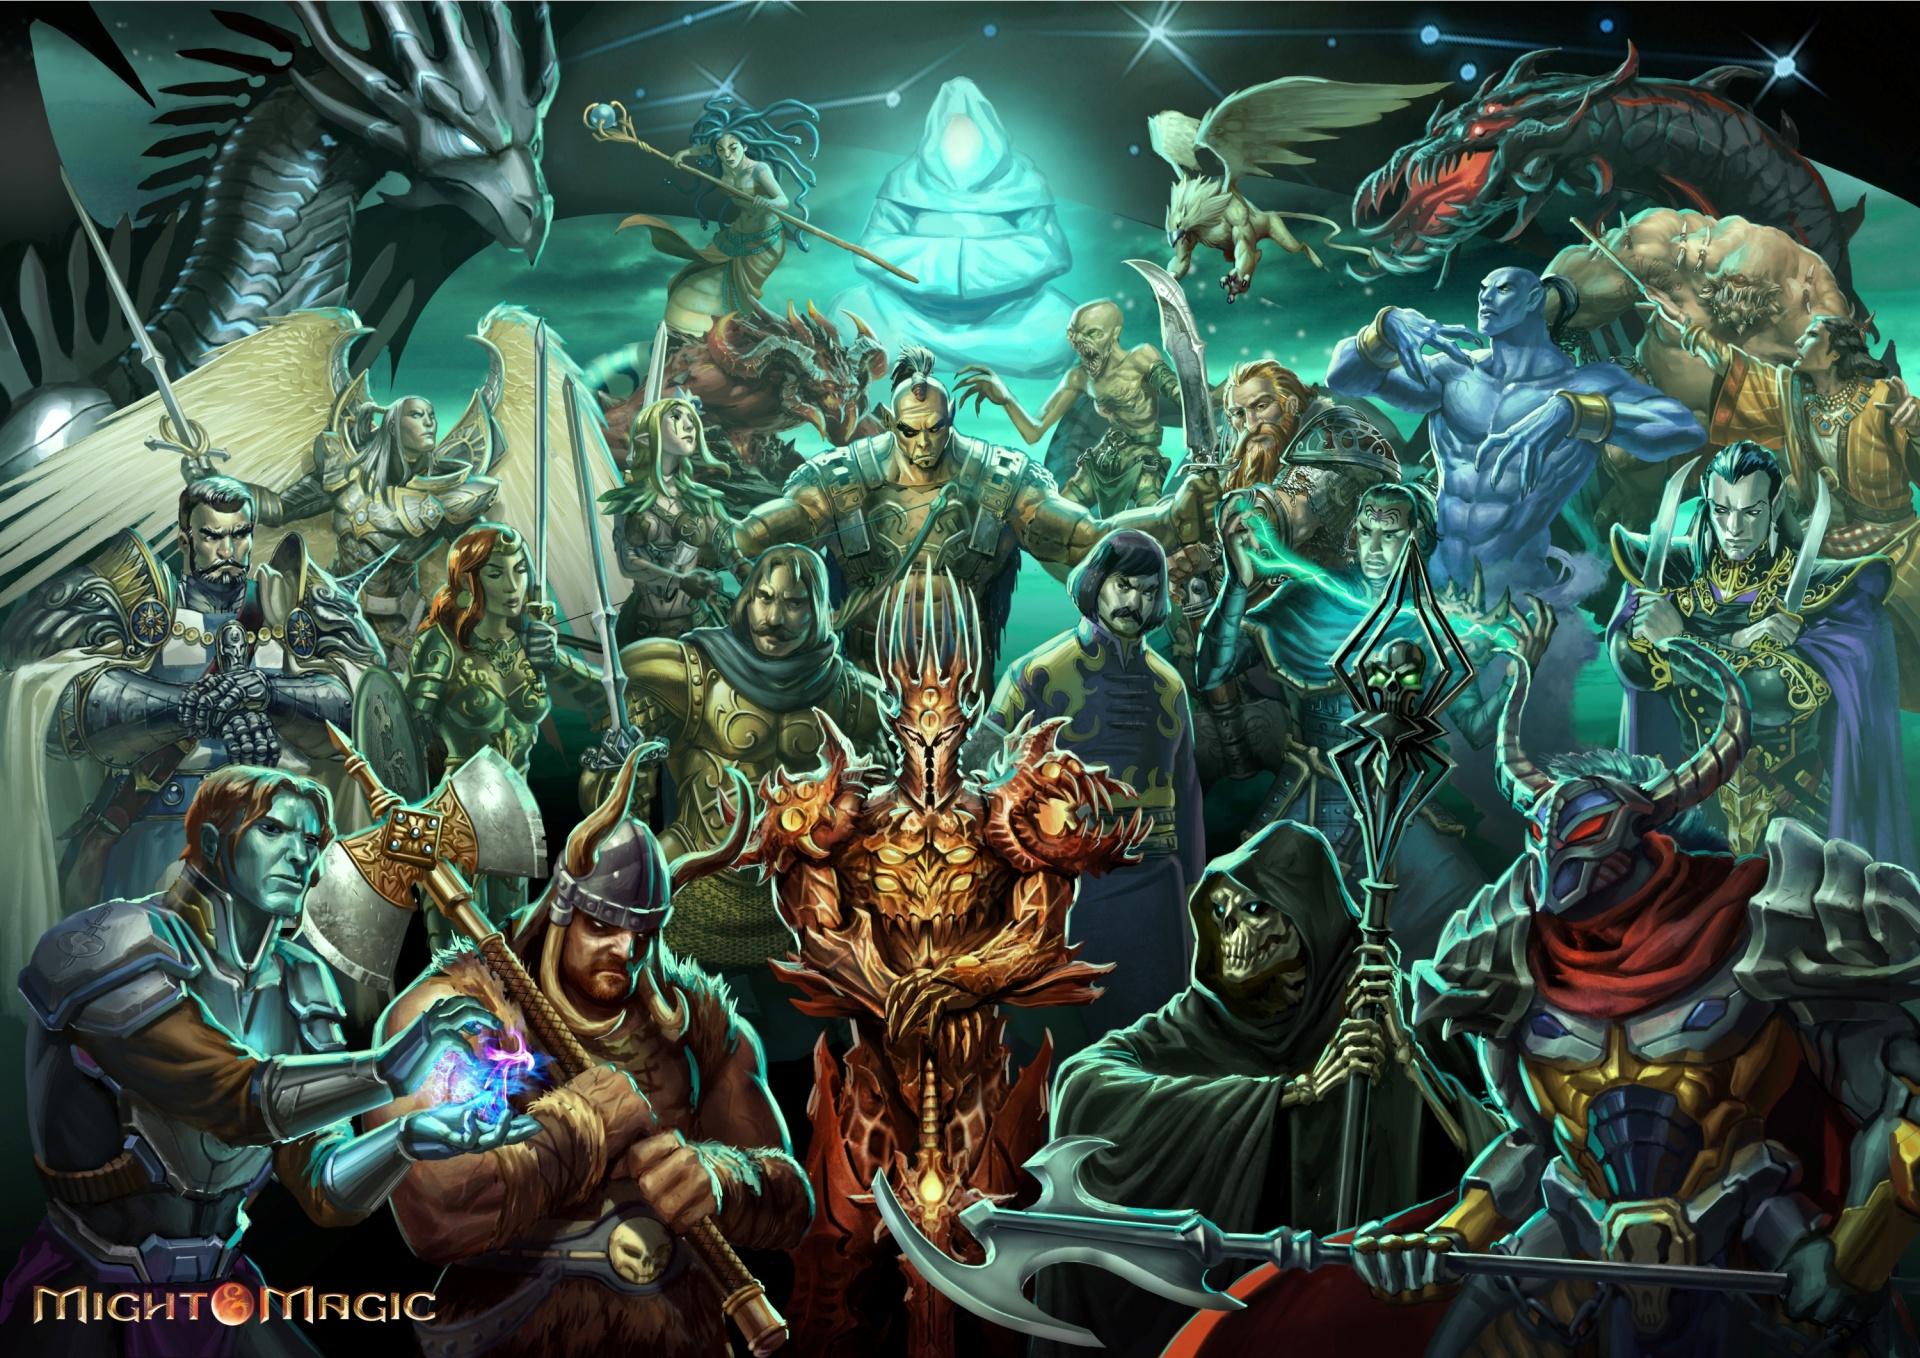 art-655399.jpeg - Might and Magic: Heroes 6